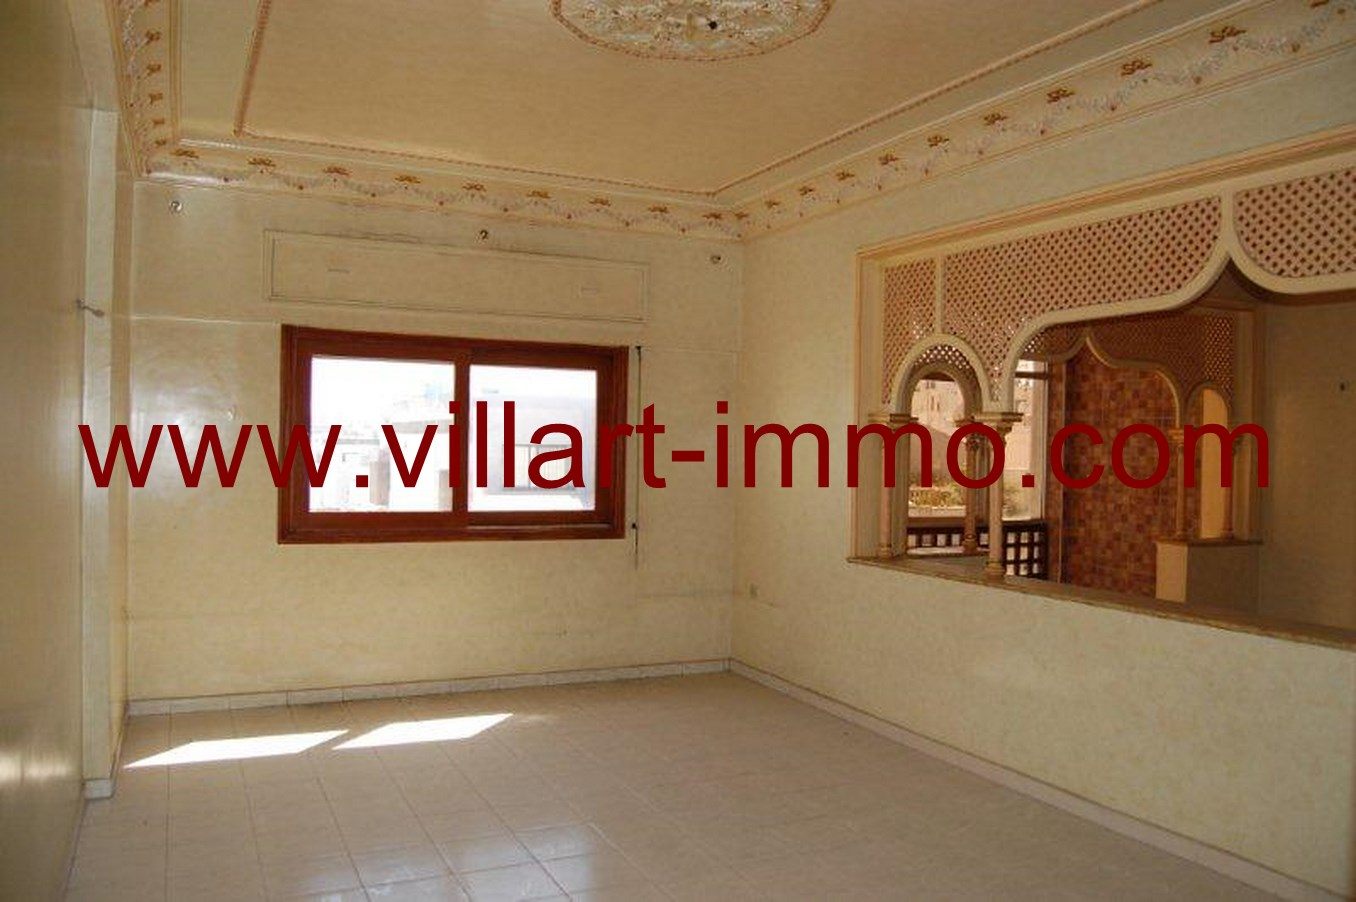 2-Location-Appartement- Non meublé-Tanger-Salon 2-L662-Villart immo